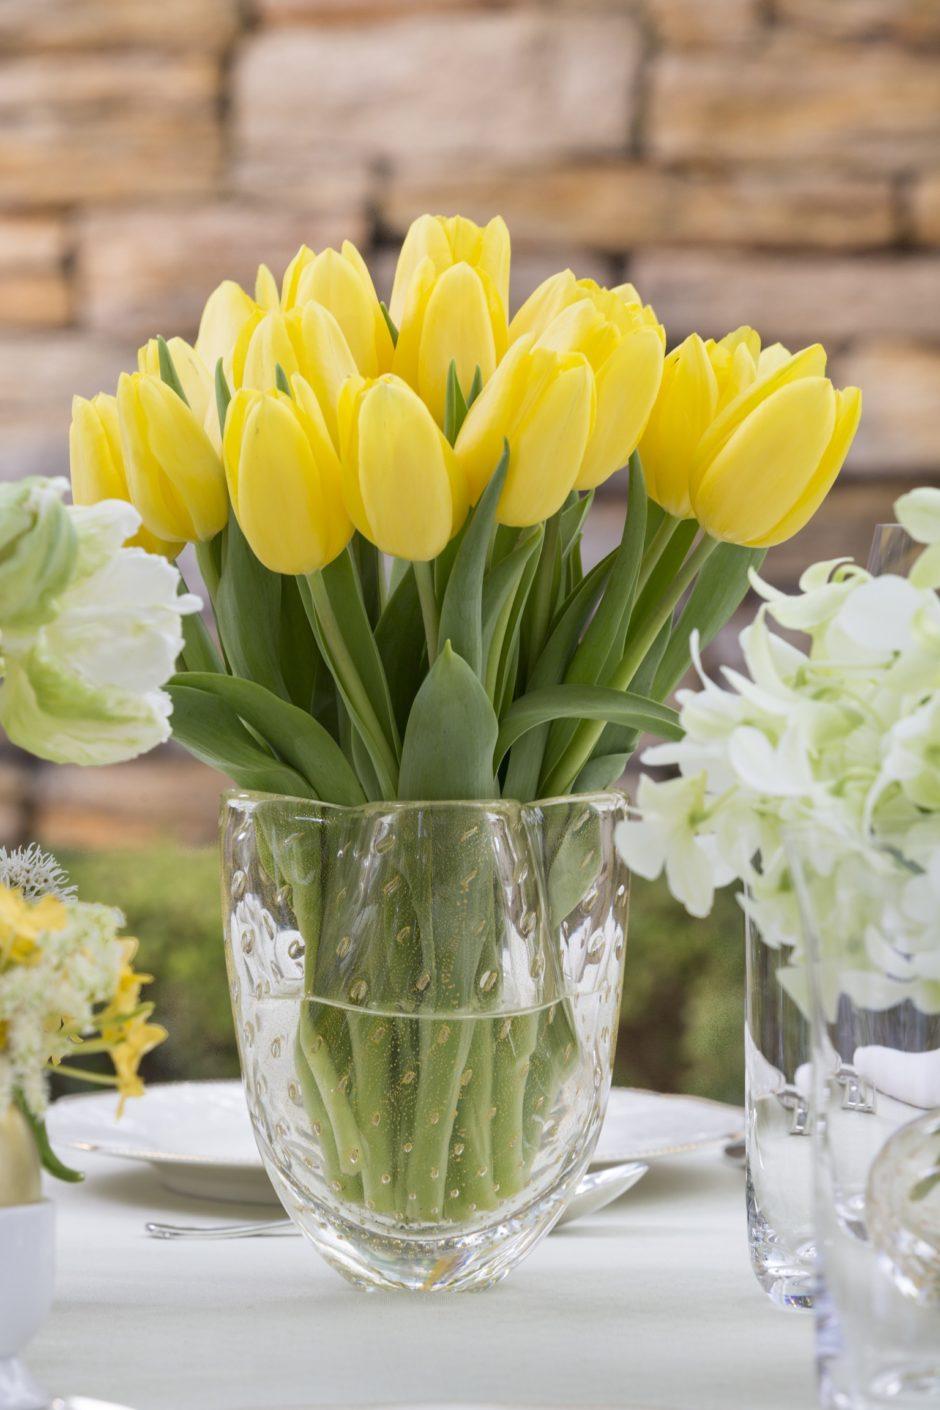 tulipas amarelas em vasos de cristal cá d'oro